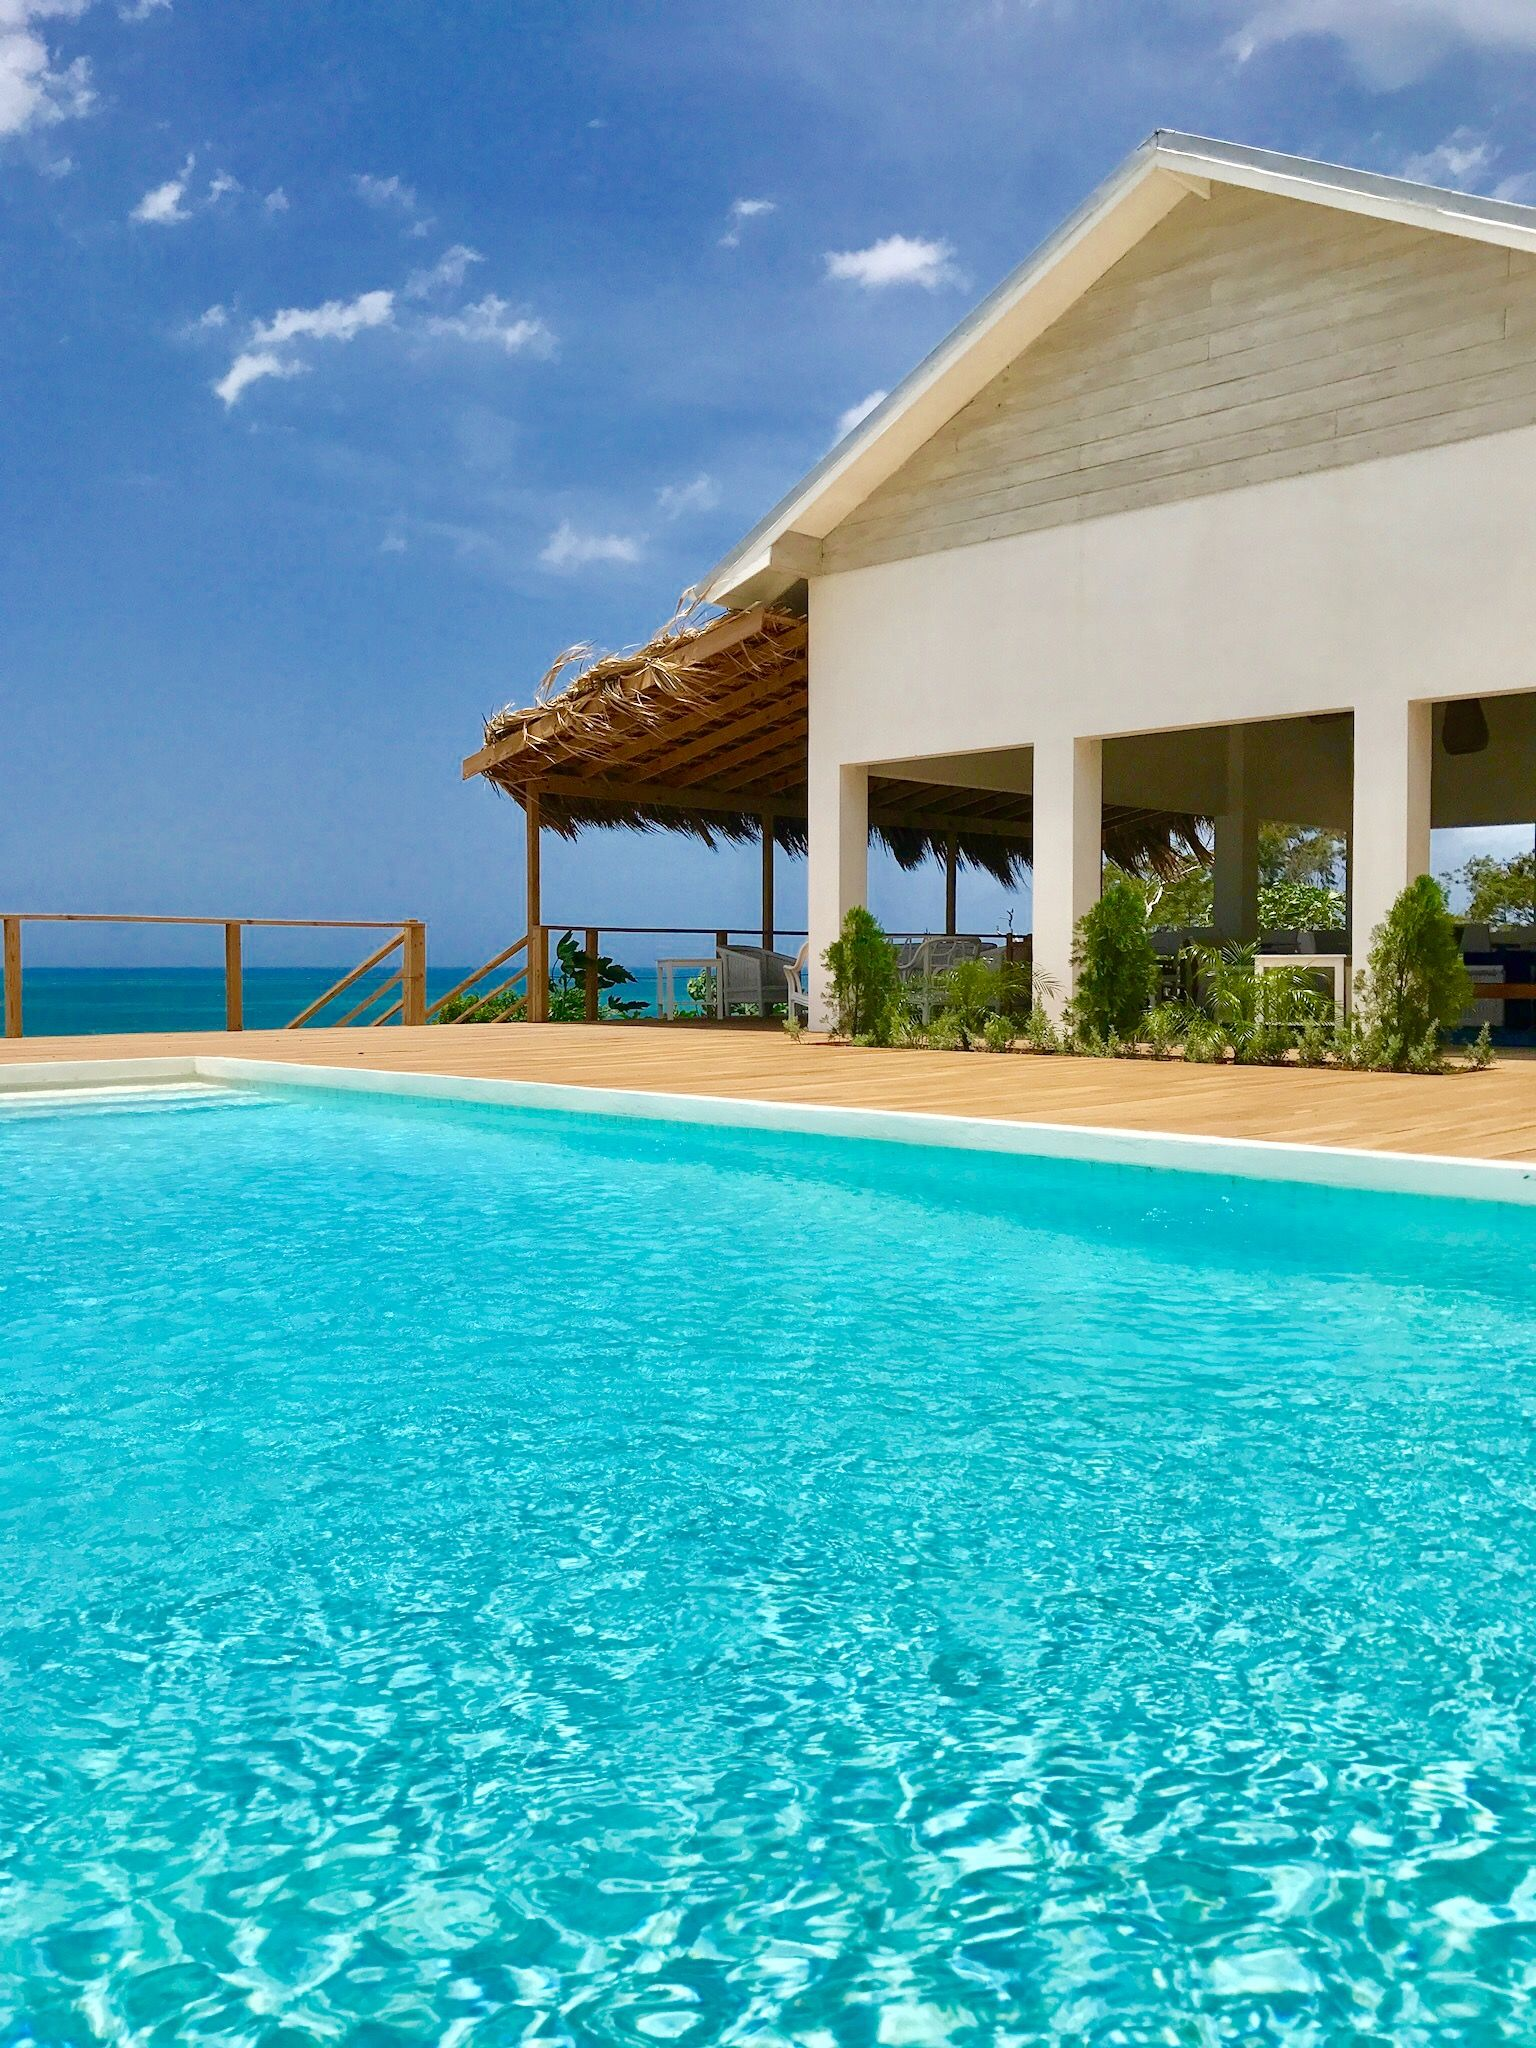 77 West Boutique Hotel Treasure Beach Jamaica